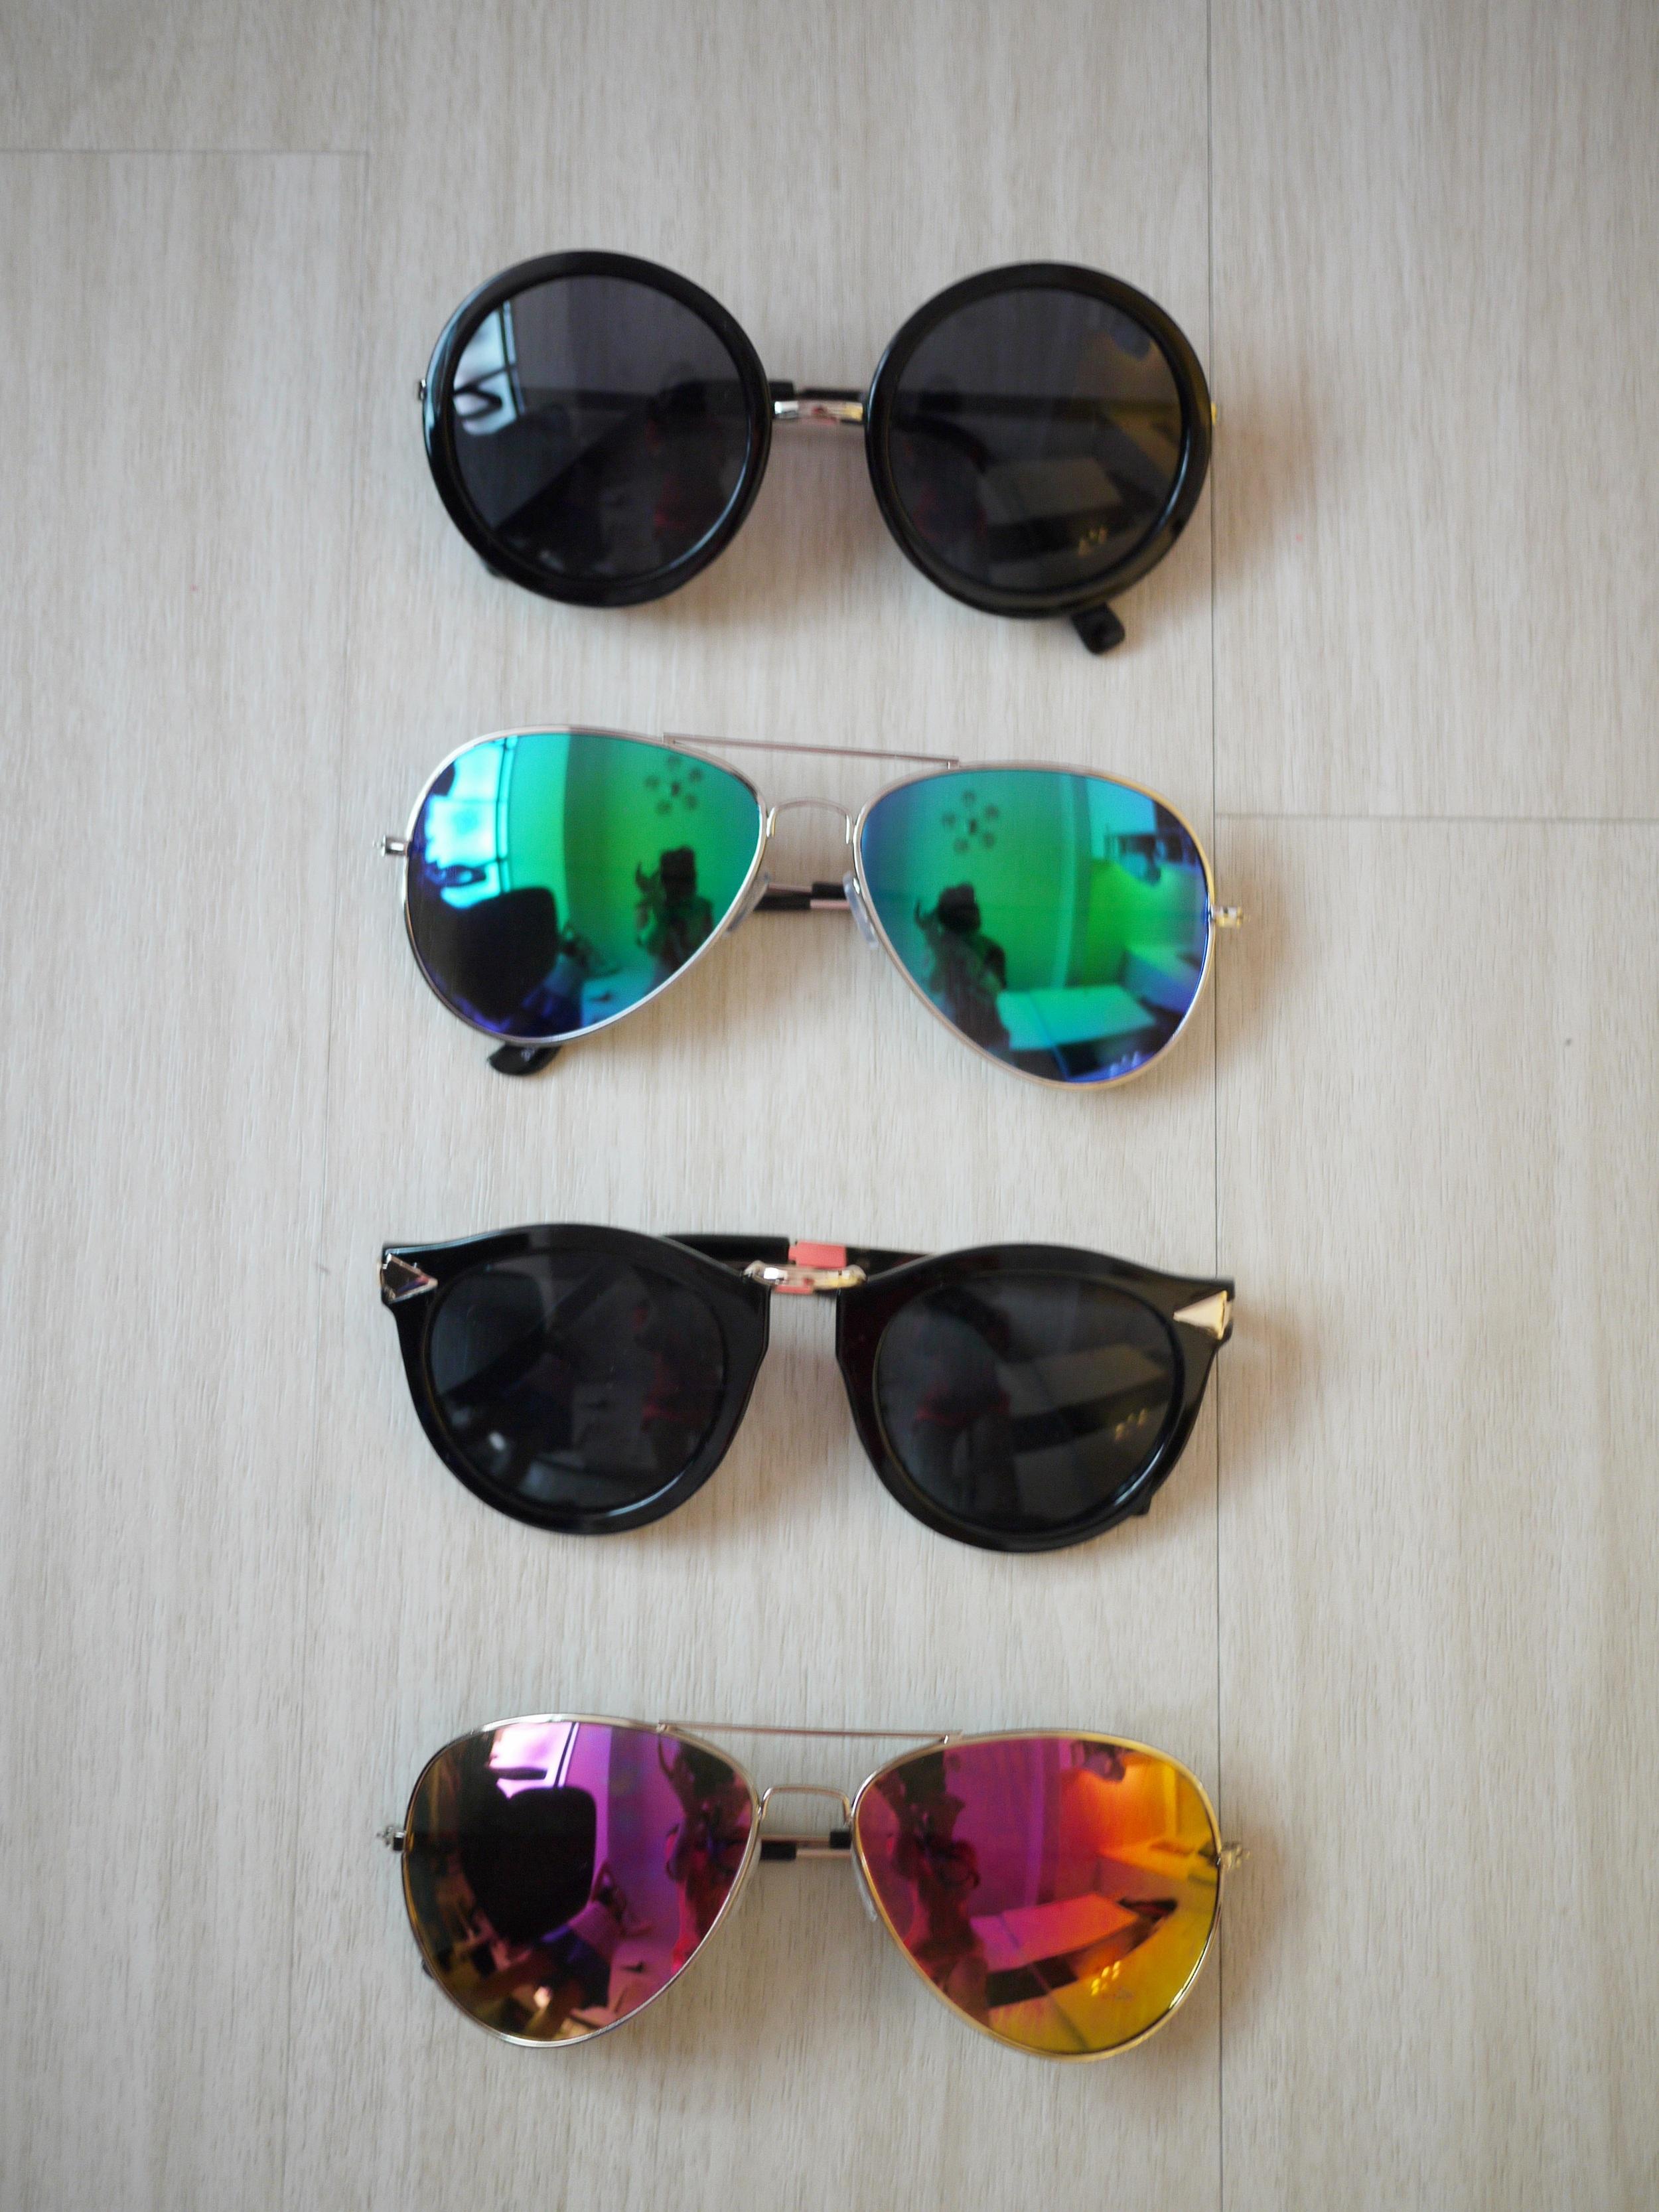 Mirrored sunglasses [水銀墨鏡 ] - Gosis604.com